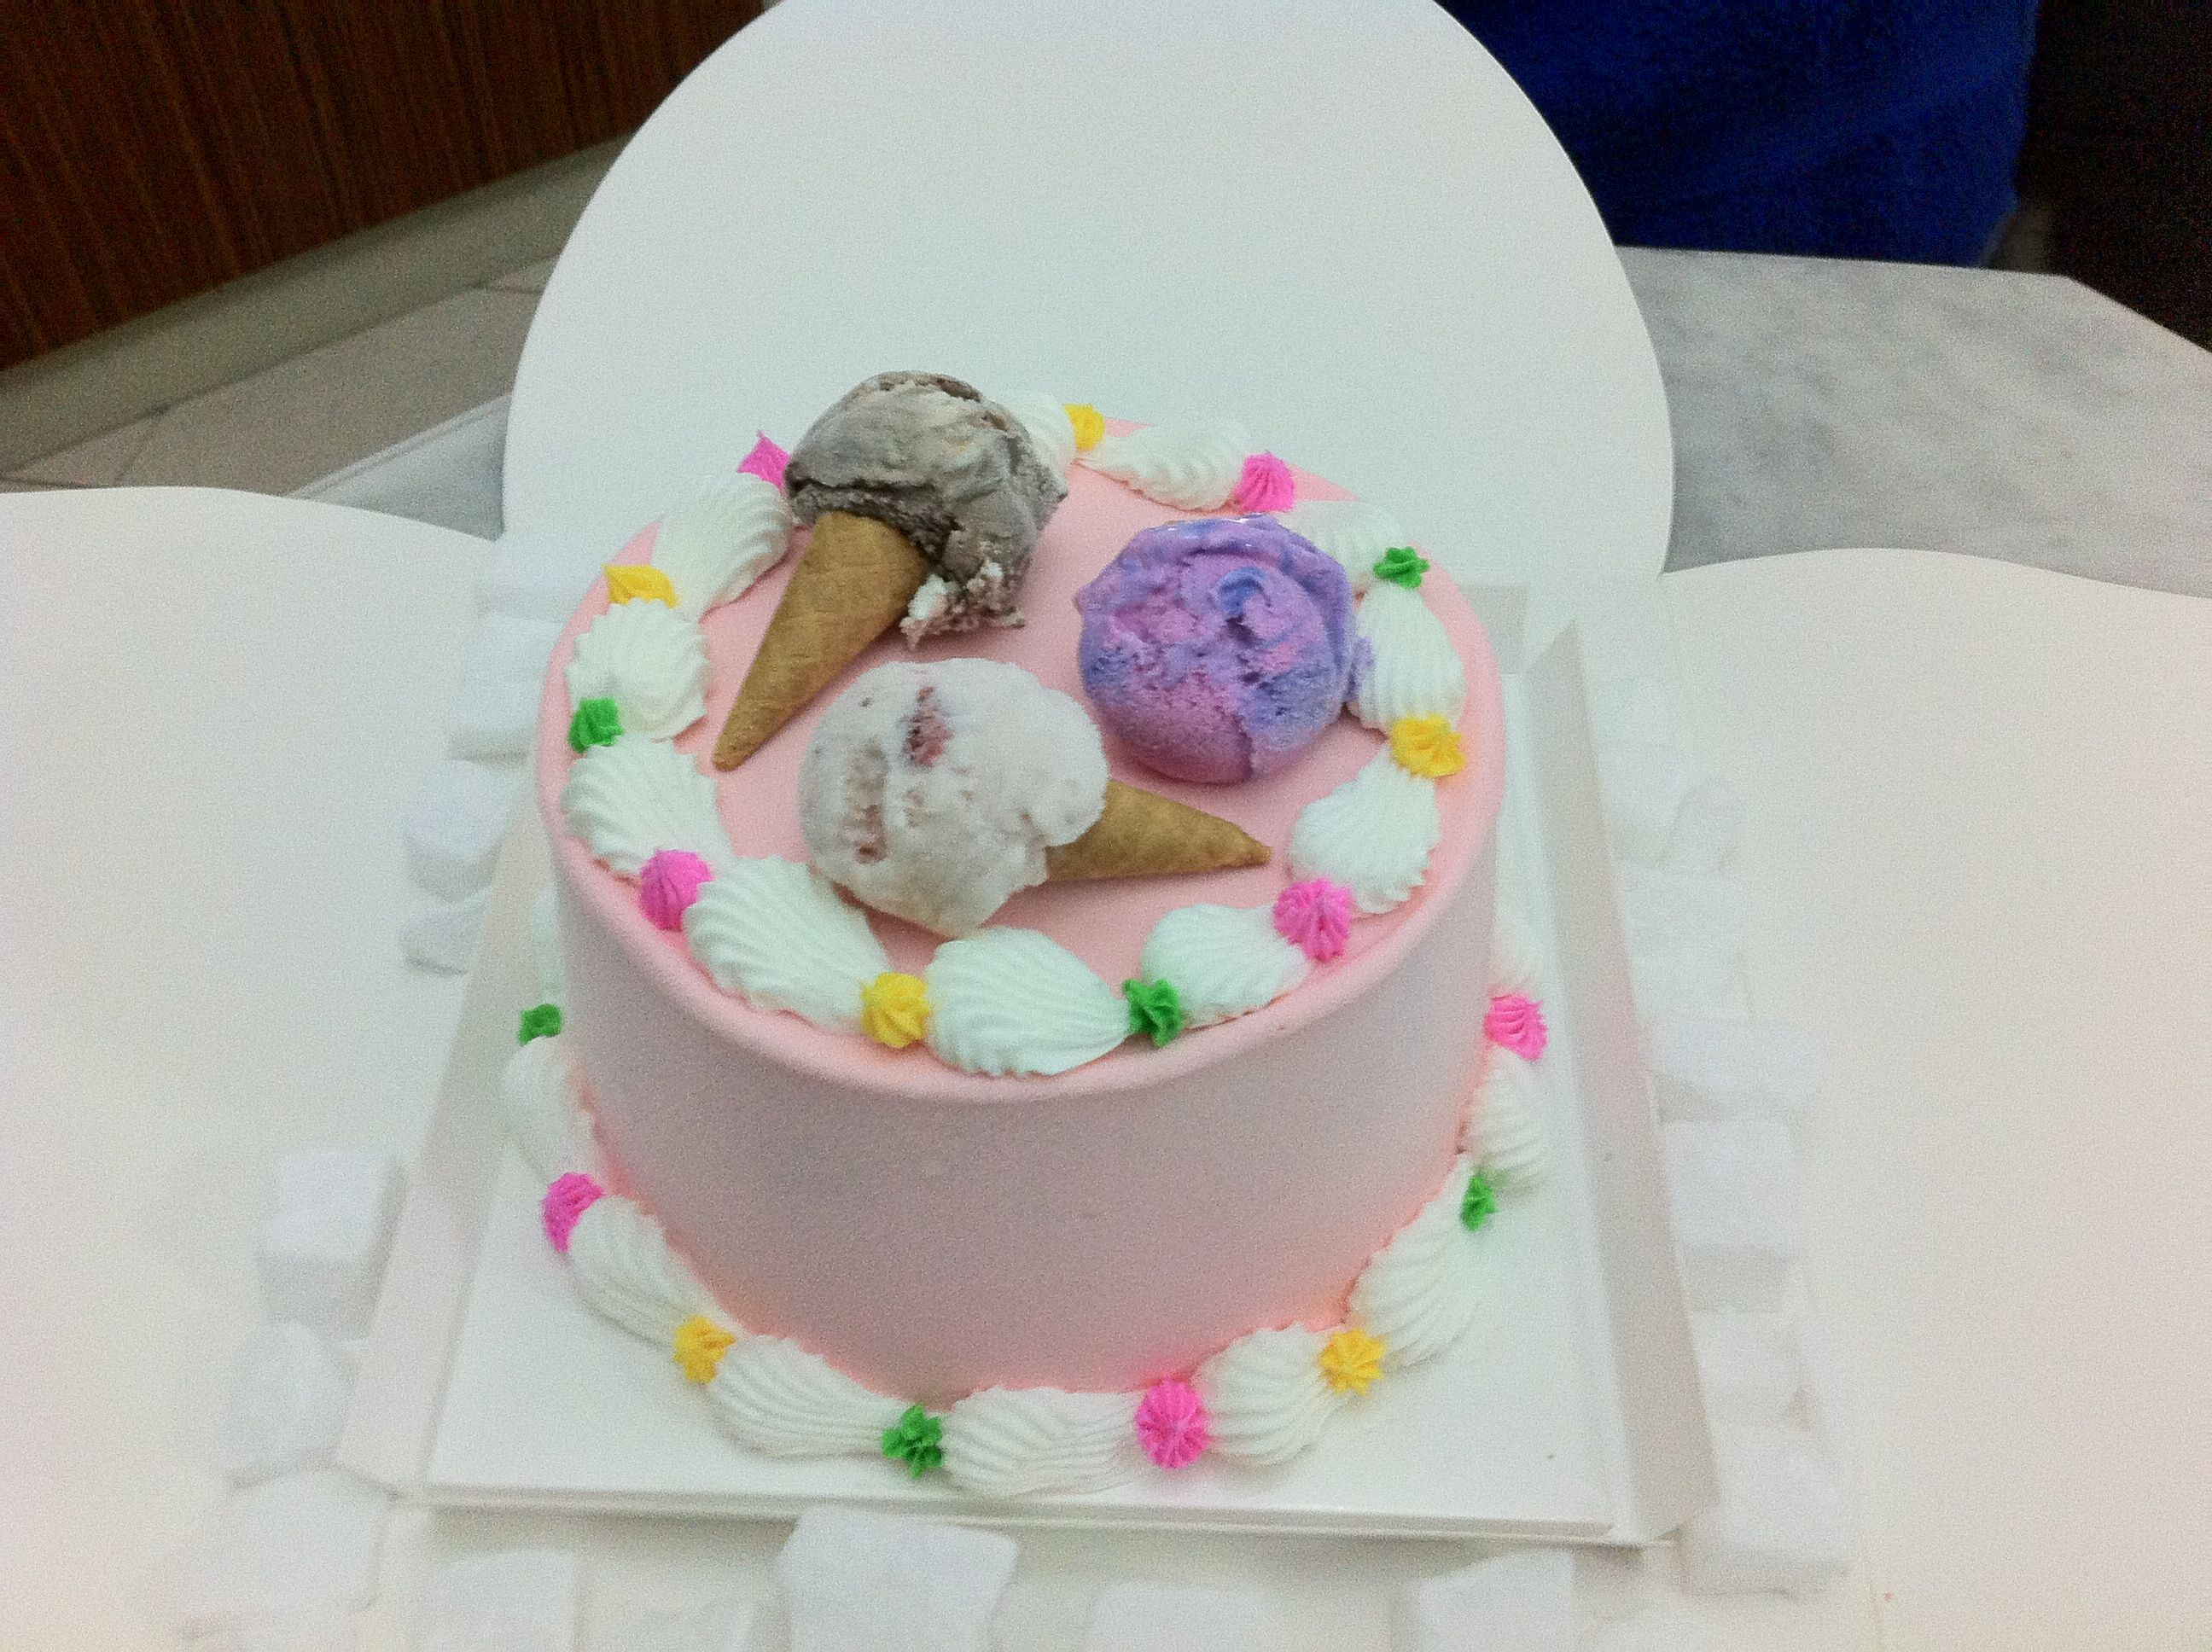 Cake Ice Cream Baskin Robbins : Ice cream cake... Baskin Robbins Cakes Pinterest